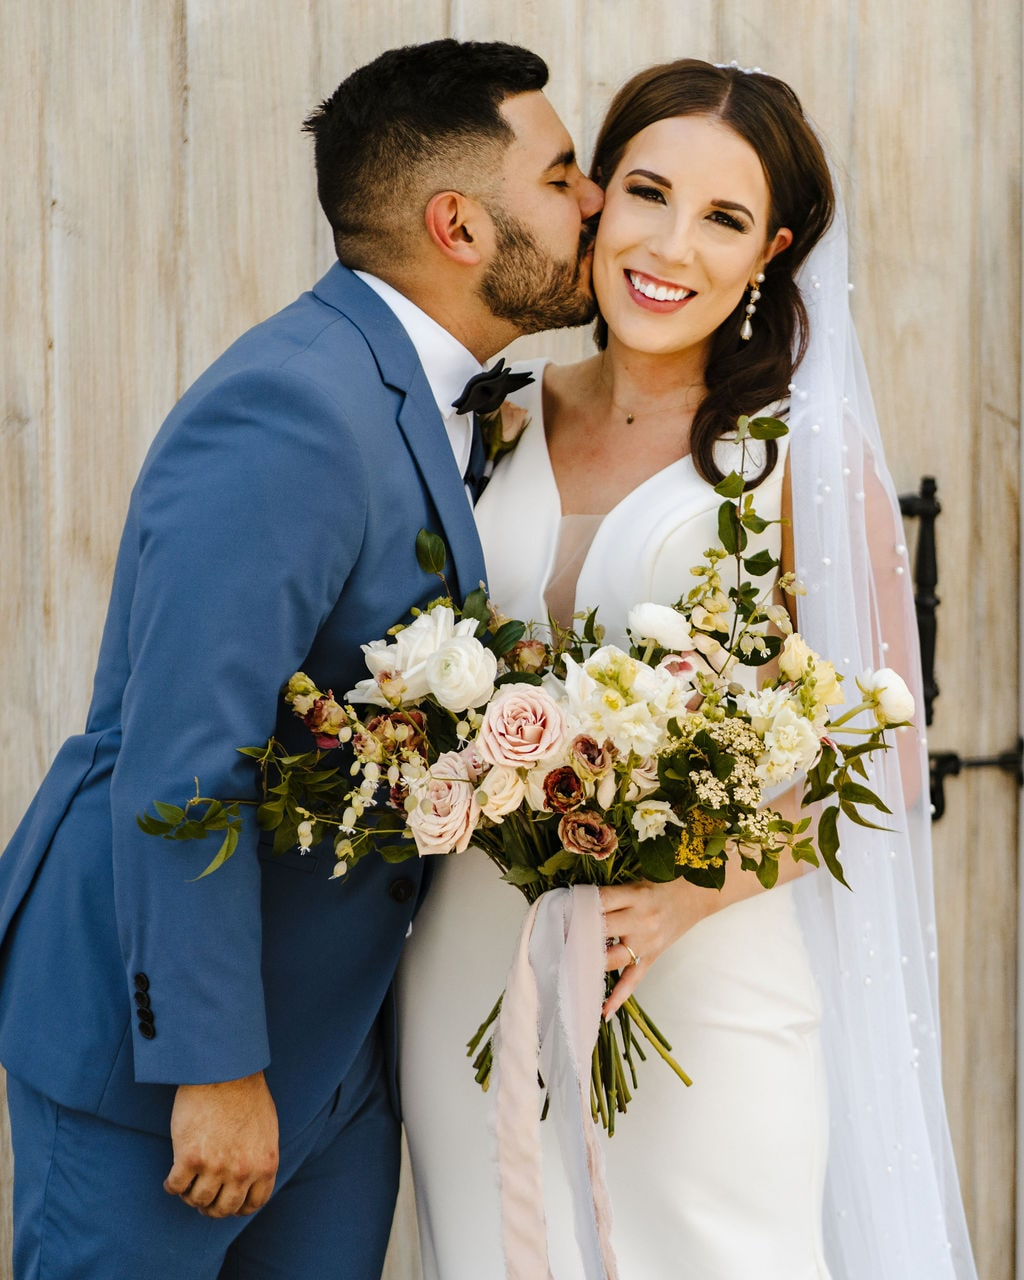 Chapel wedding, garden style wedding flowers, organic bouquets